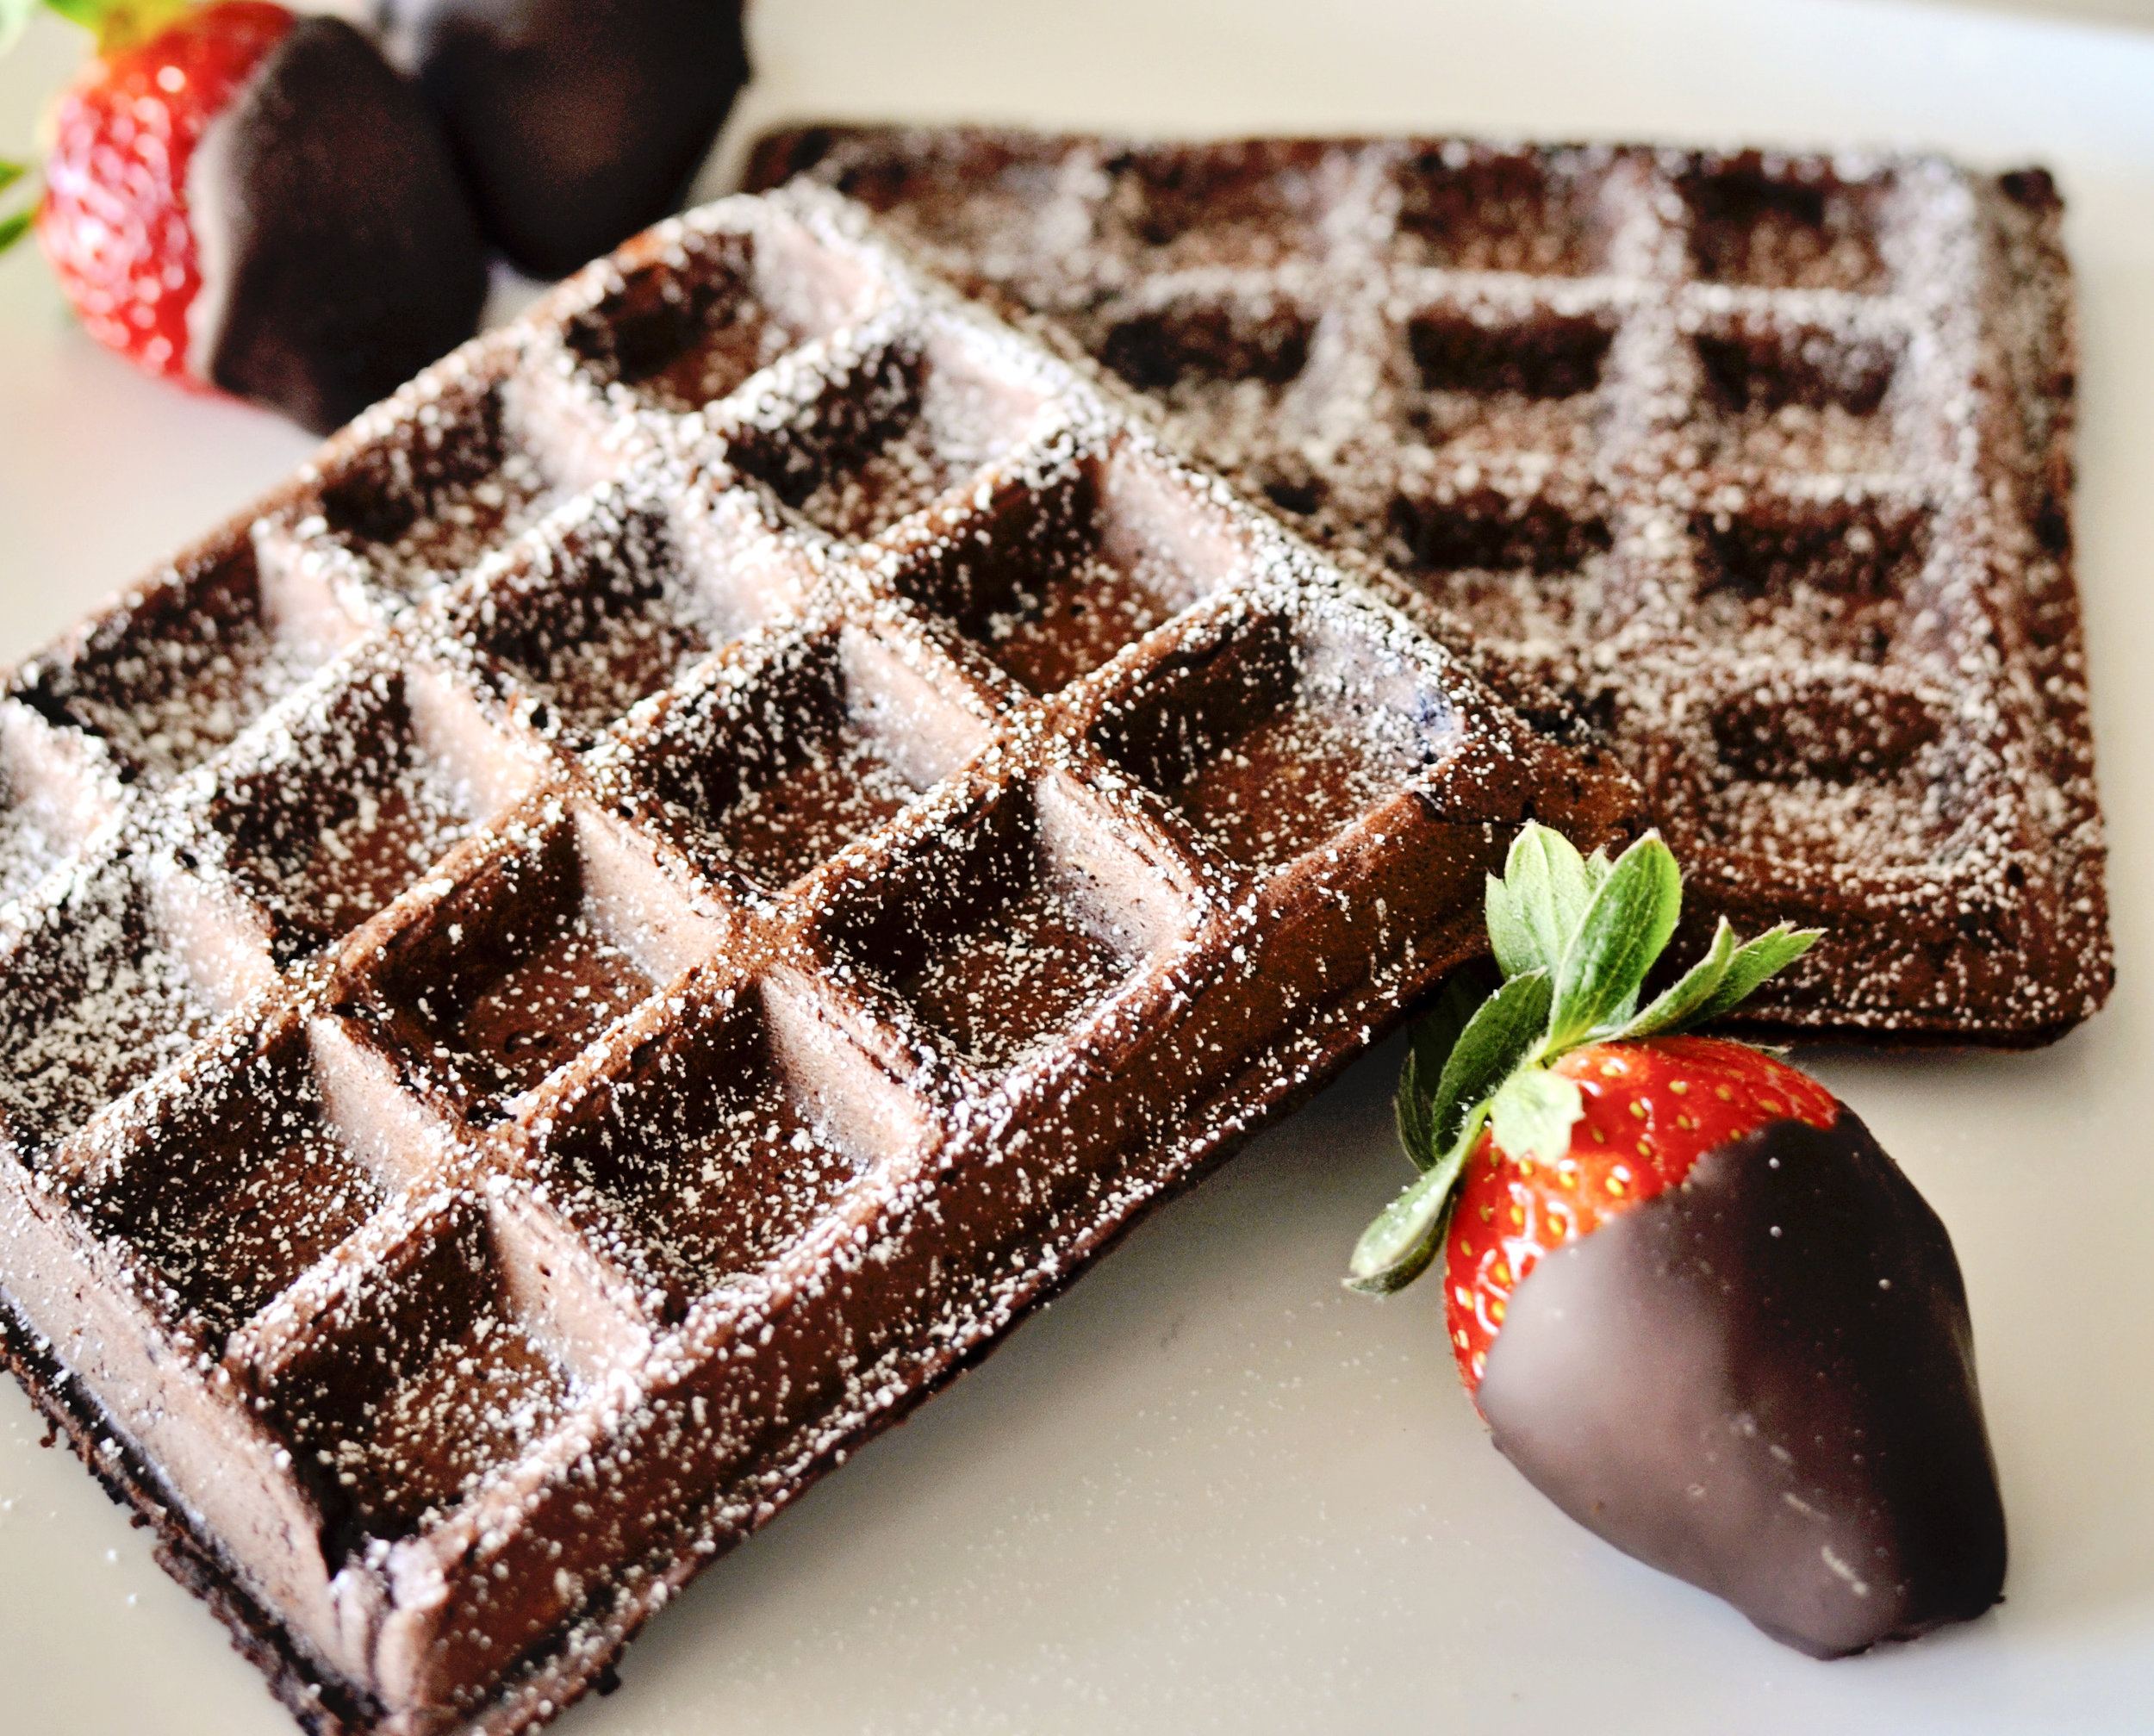 ChocolateWaffles GigiWilson copy.jpg